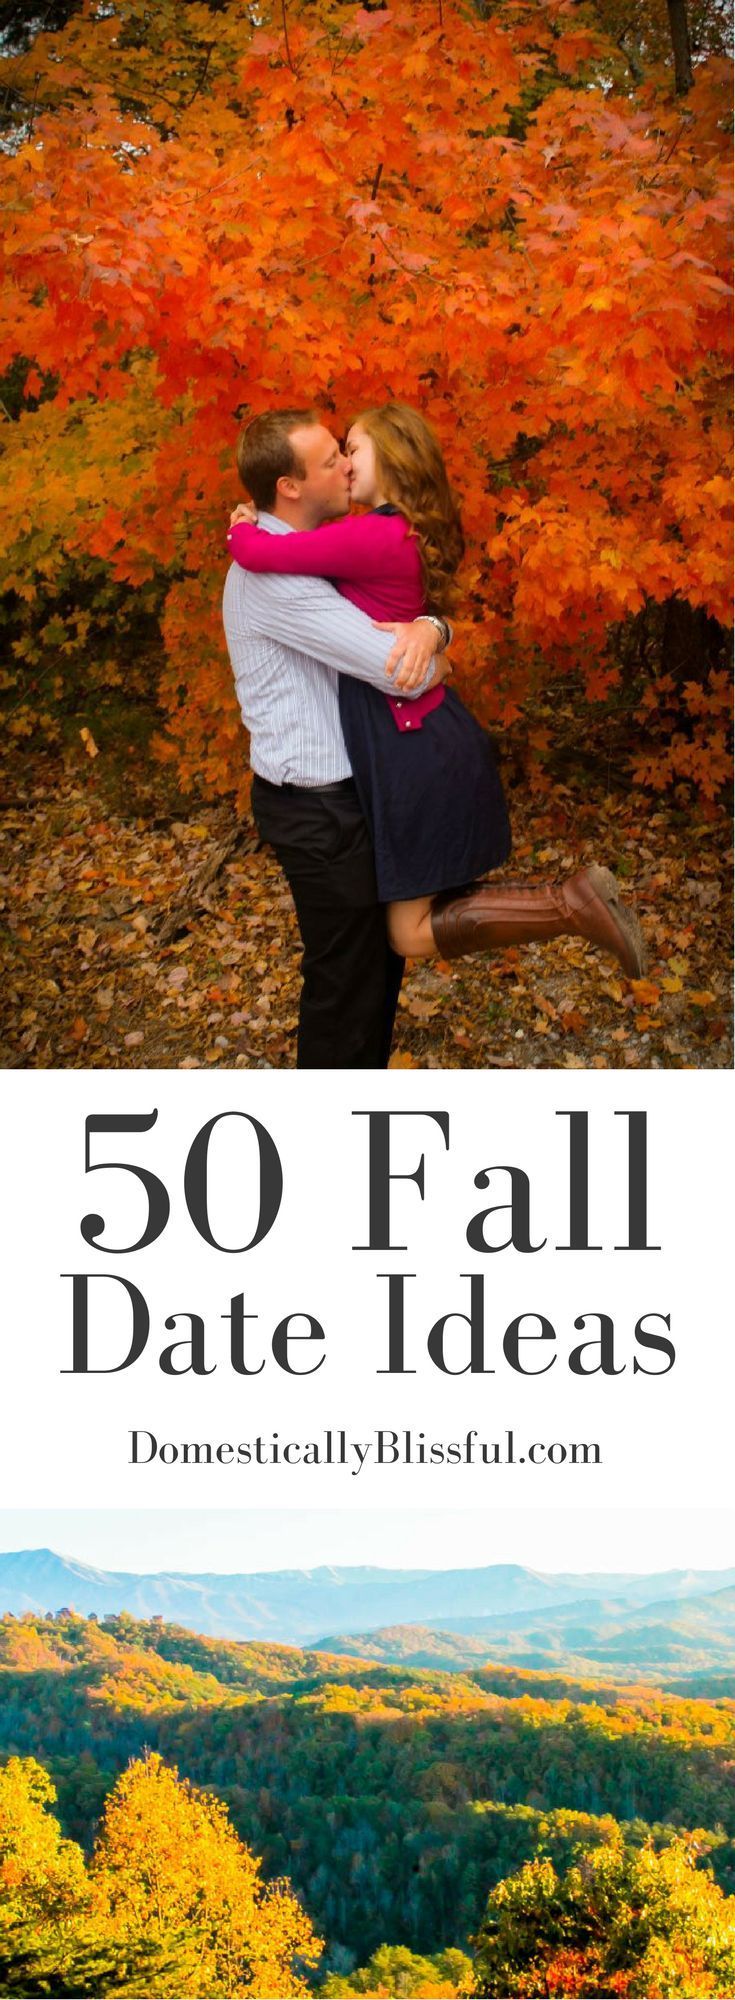 Fun dating ideas in houston